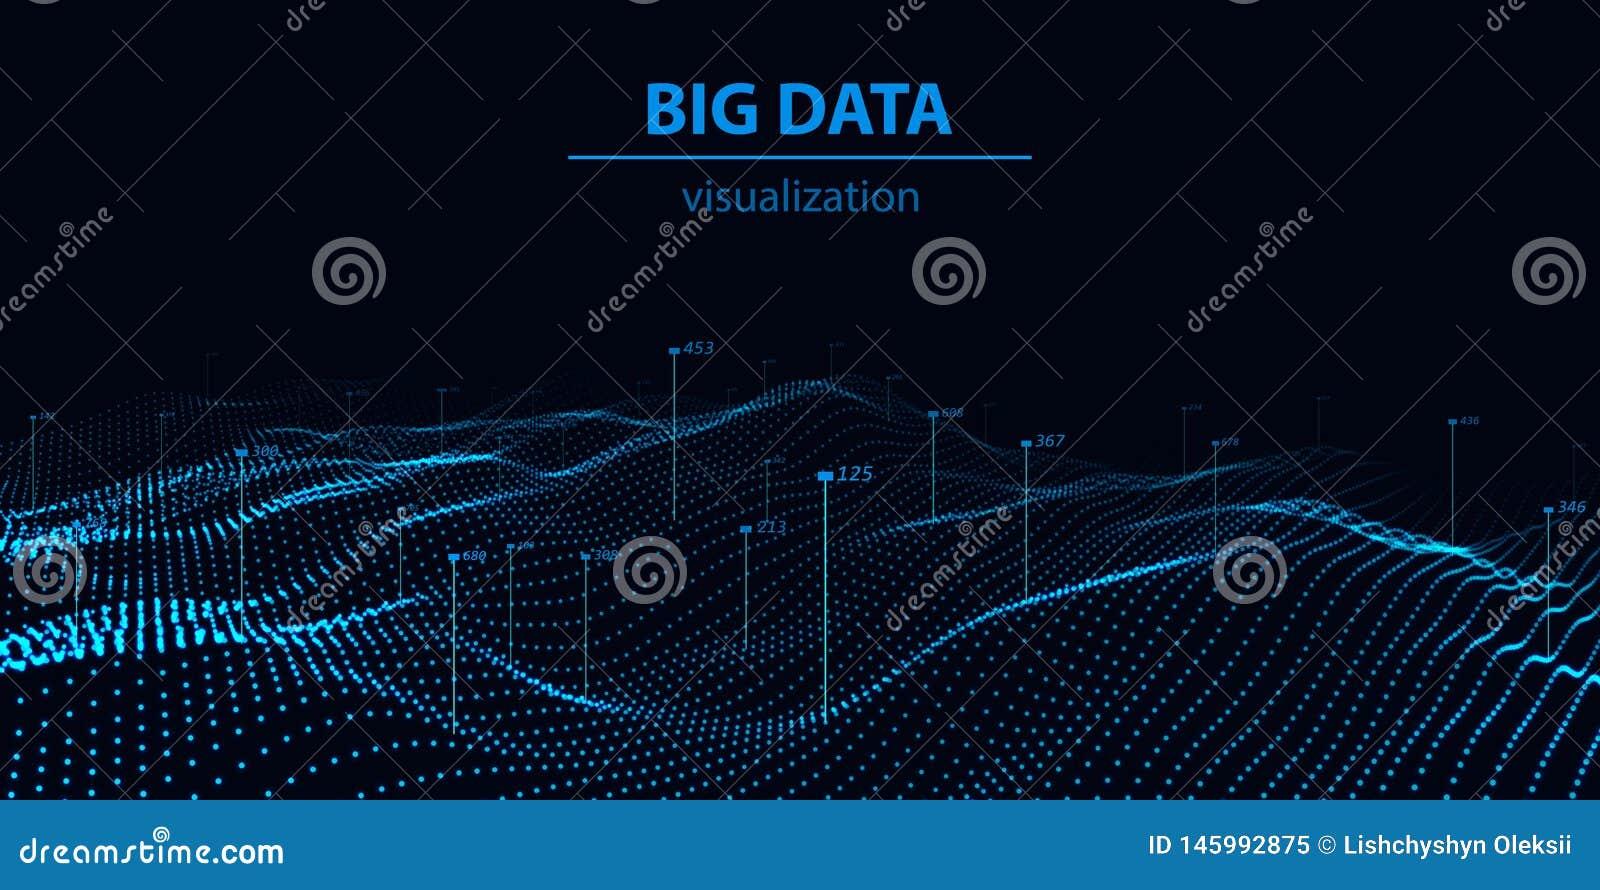 Big data visualization 3D. Technology wave. Analytics representation. Digital background